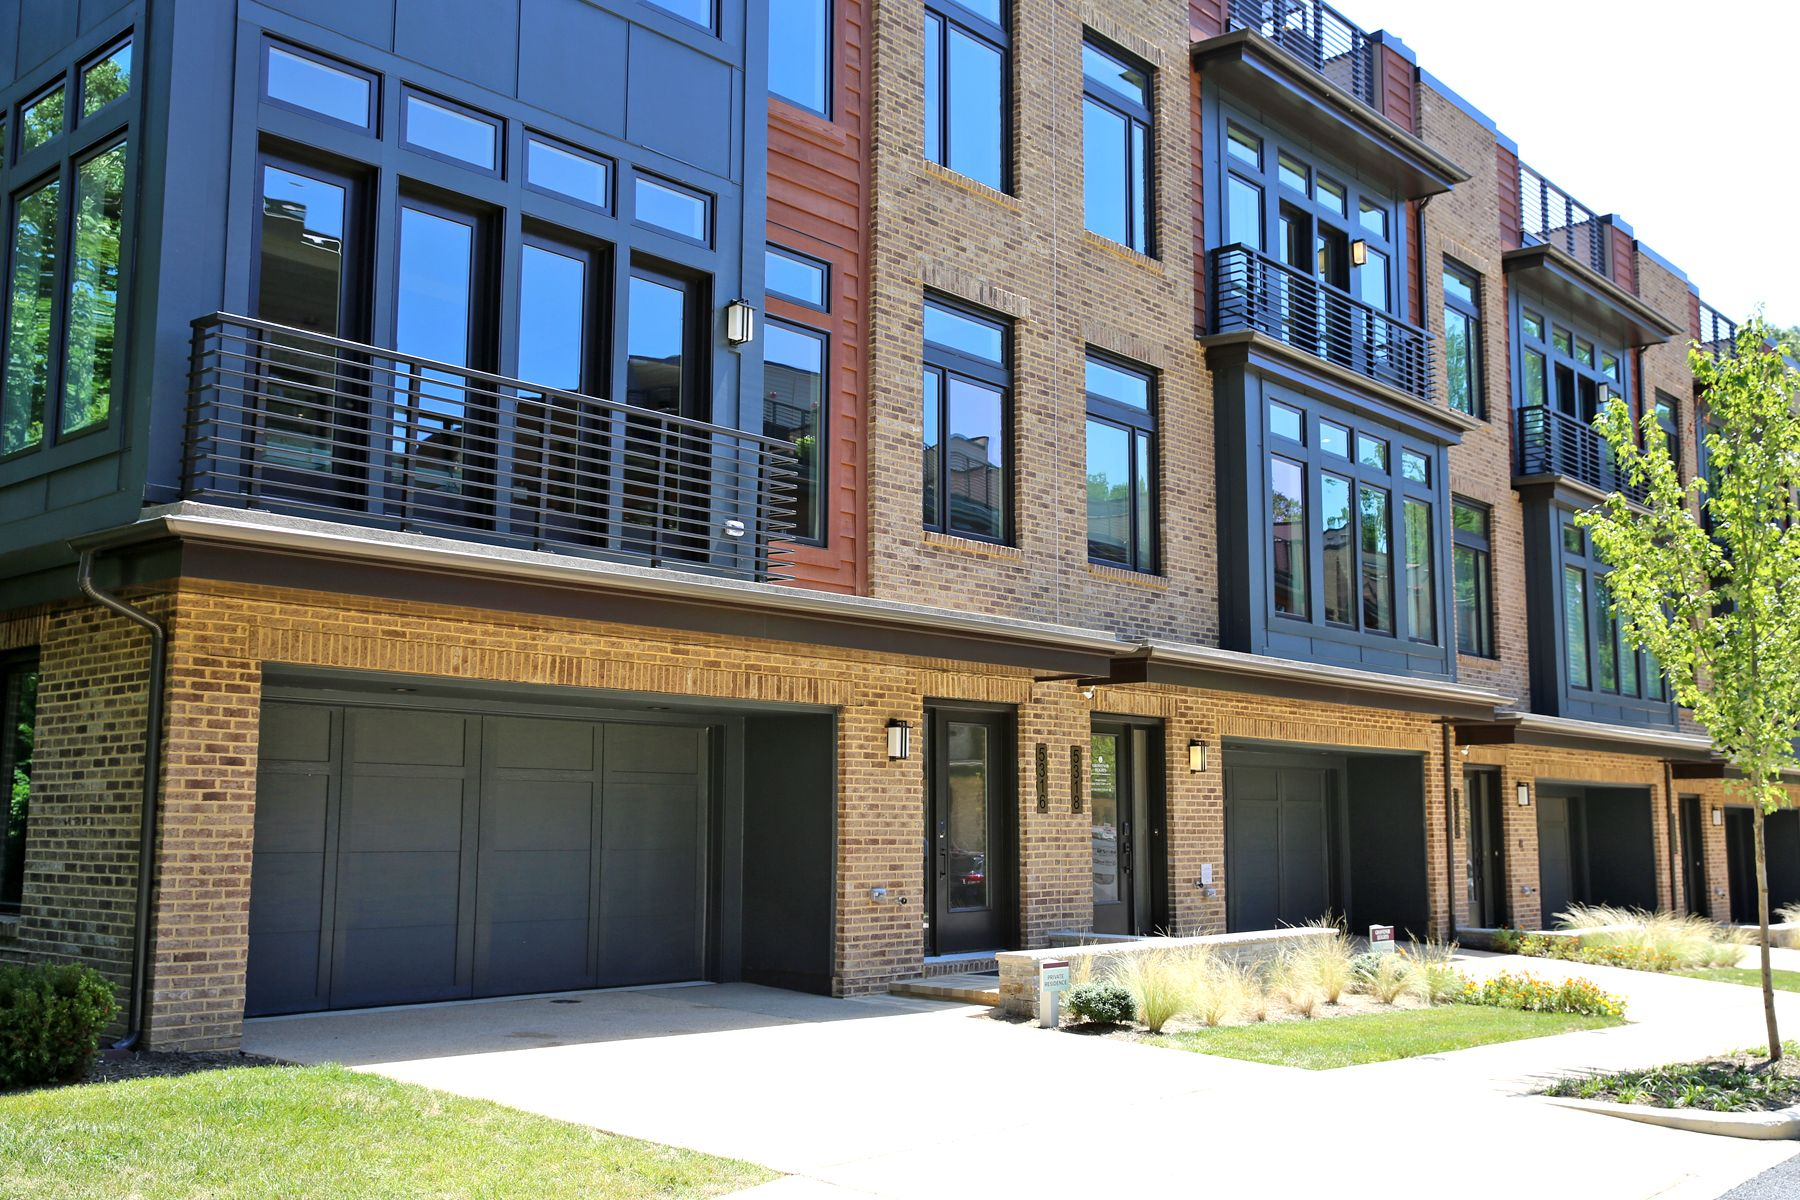 Overhead door company of washington dc is proud to provide the overhead door company of washington dc is proud to provide the garage doors rubansaba